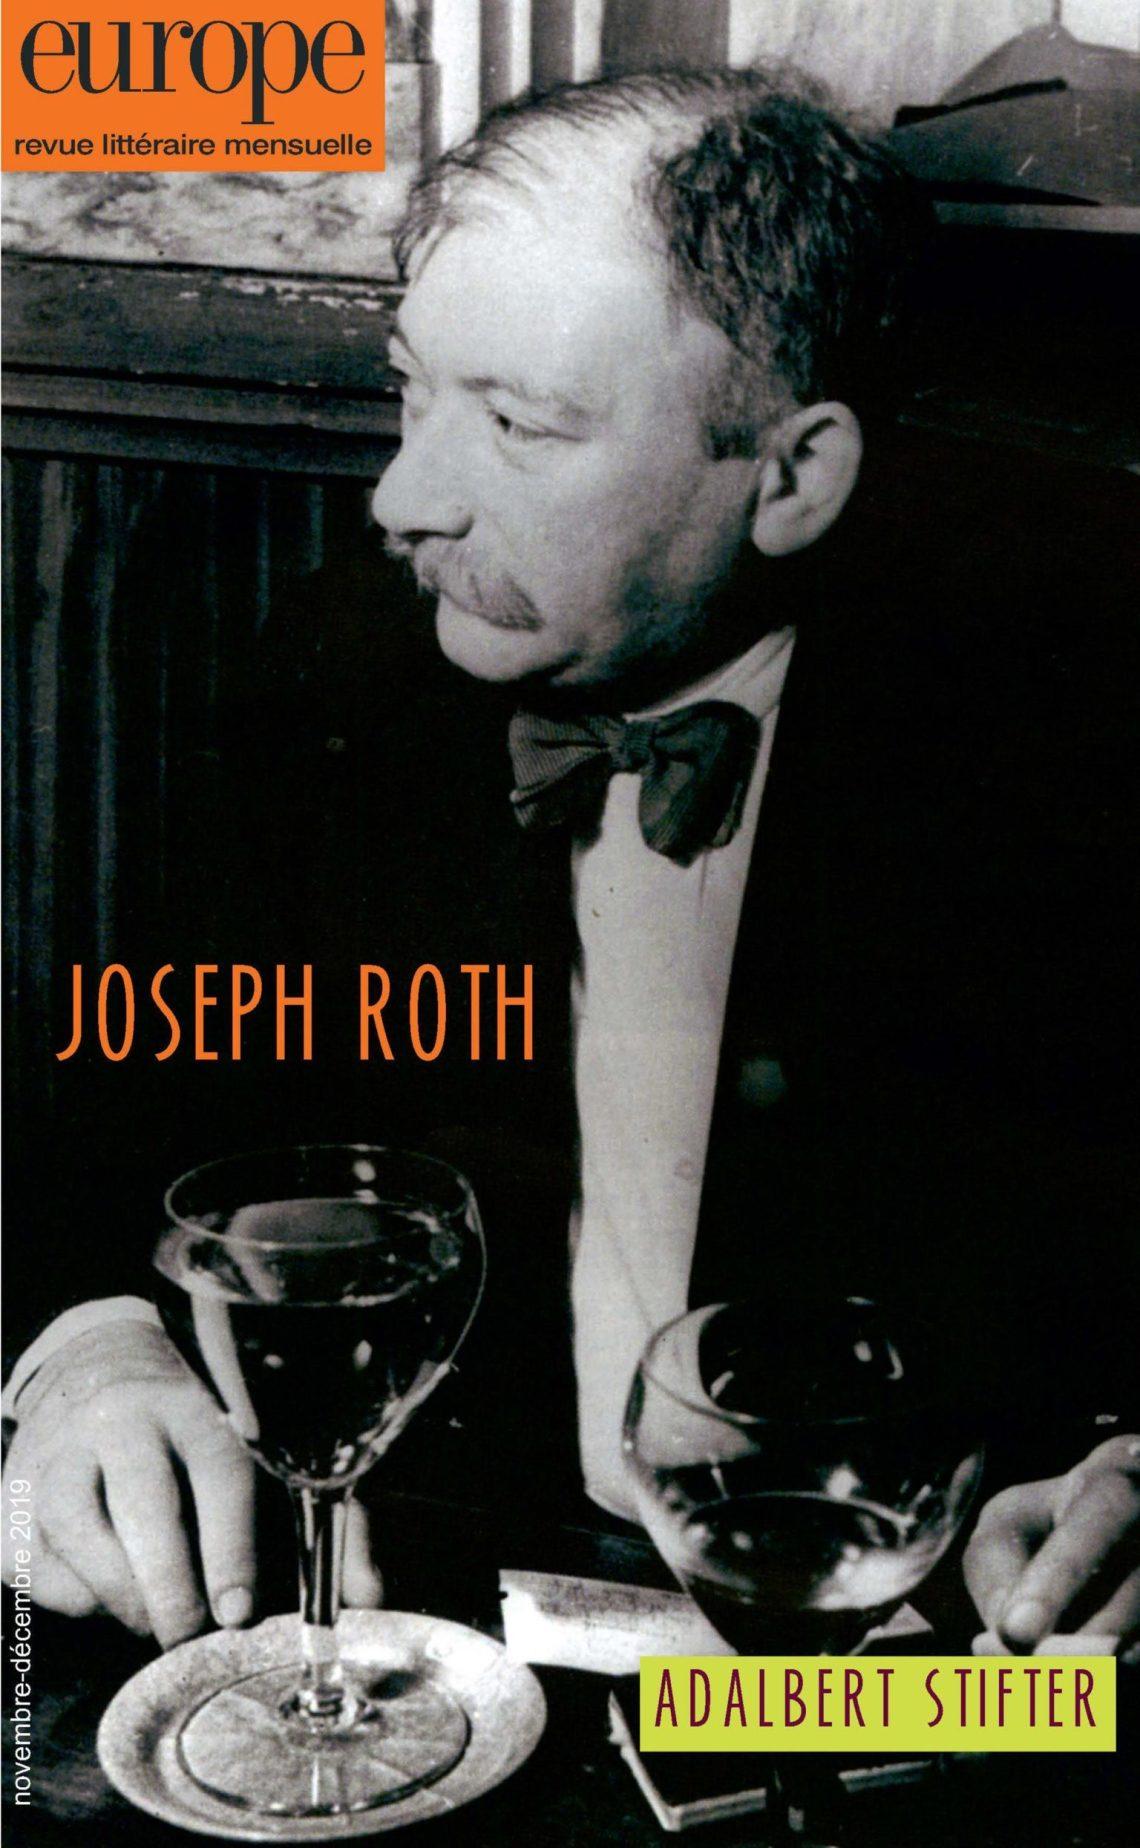 Europe, n° 1087-1088 (nov.-déc. 2019) : Joseph Roth, Adalbert Stifter